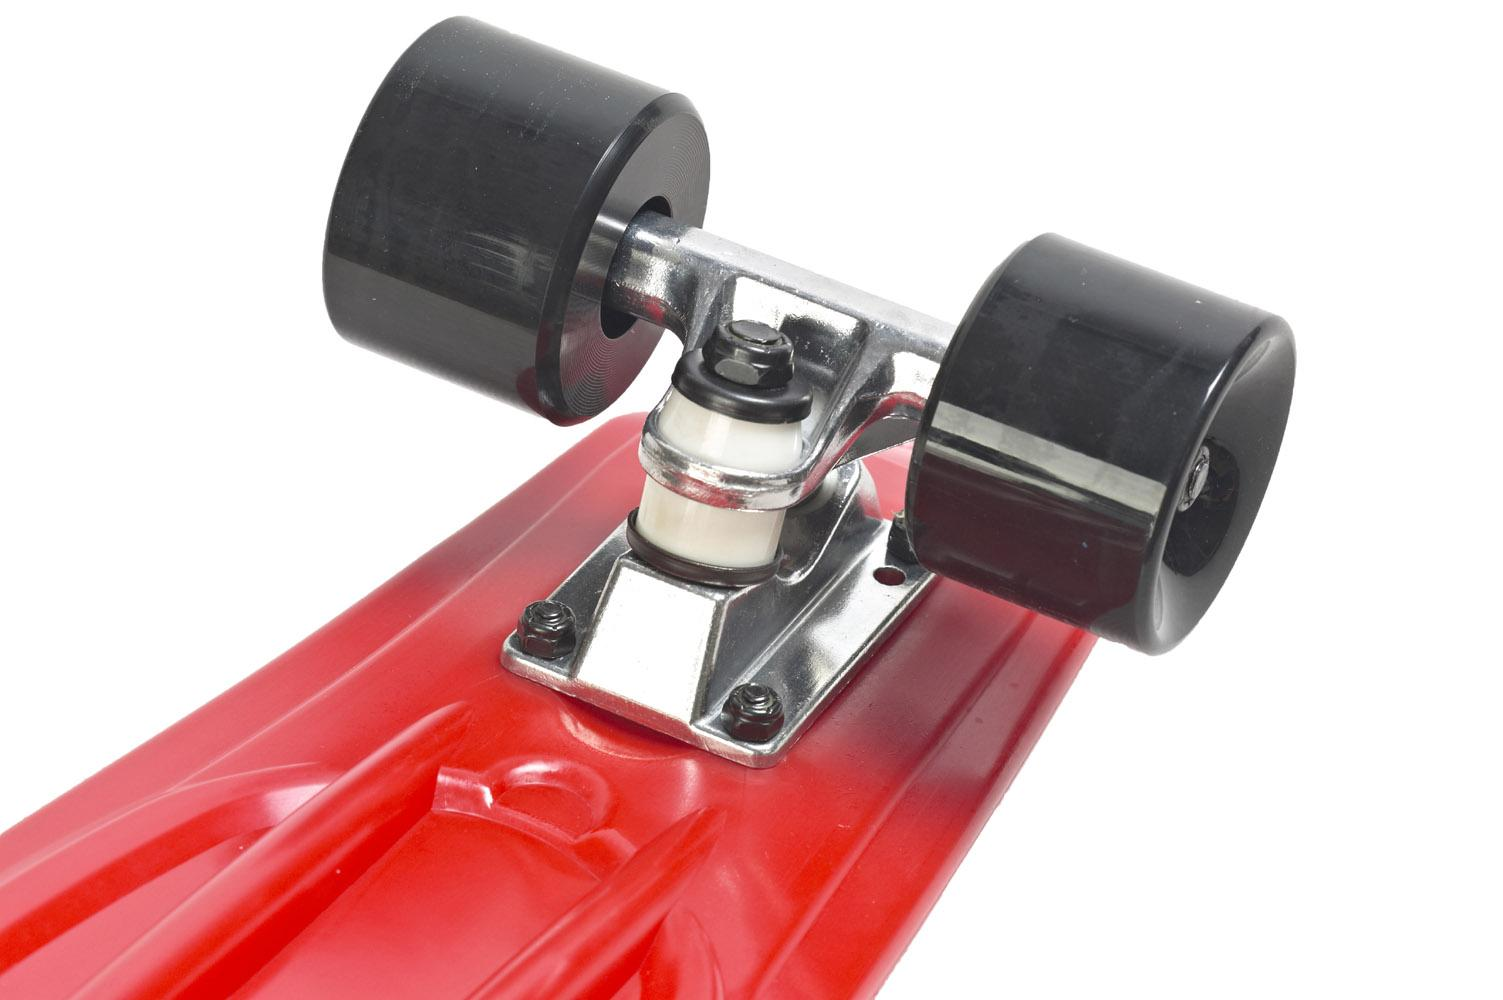 4023000 - Sparta® Plastic Handle w/Reinforced Tip 36